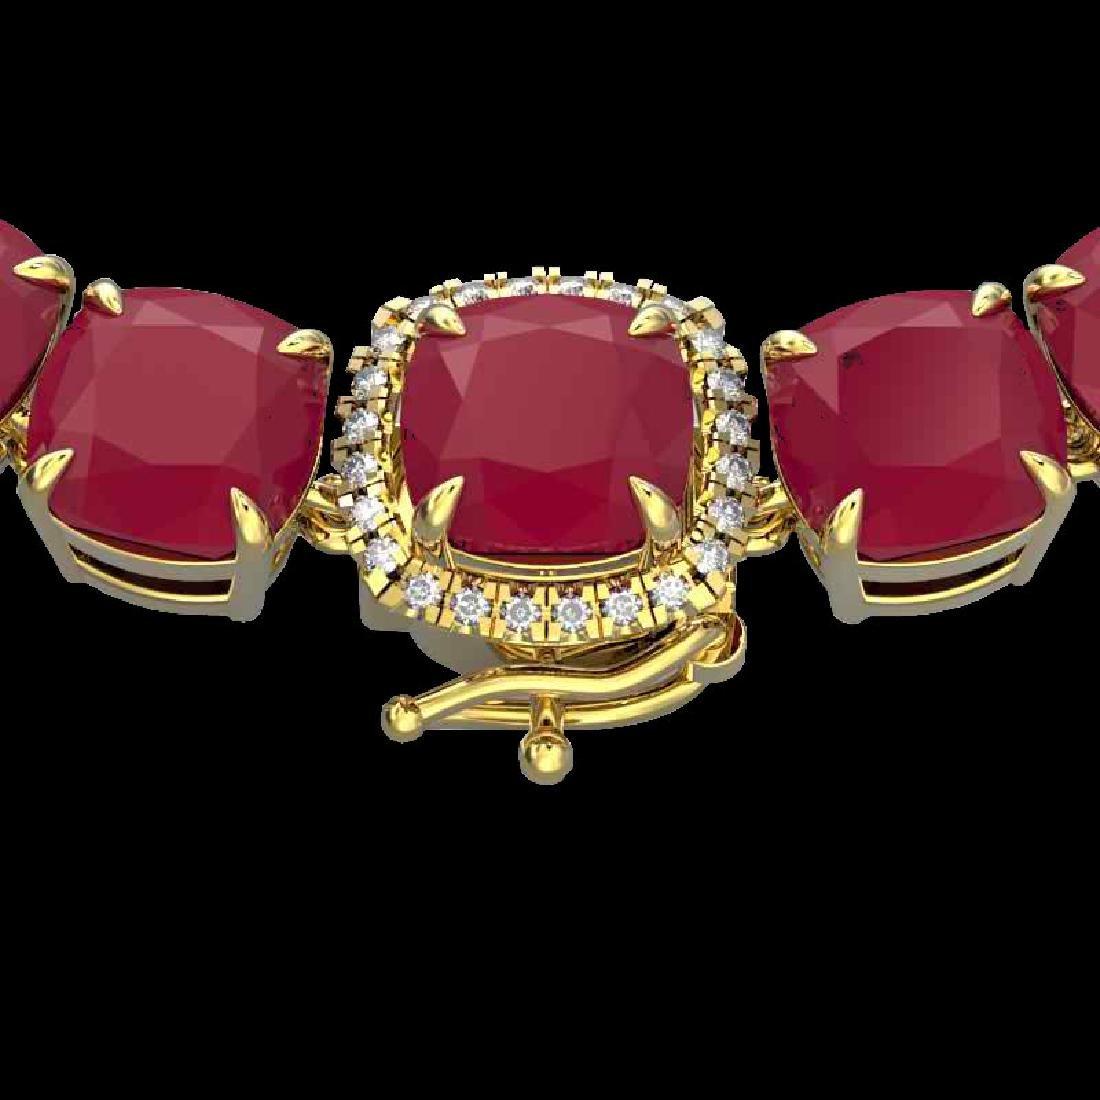 116 CTW Ruby & VS/SI Diamond Halo Micro Pave Necklace